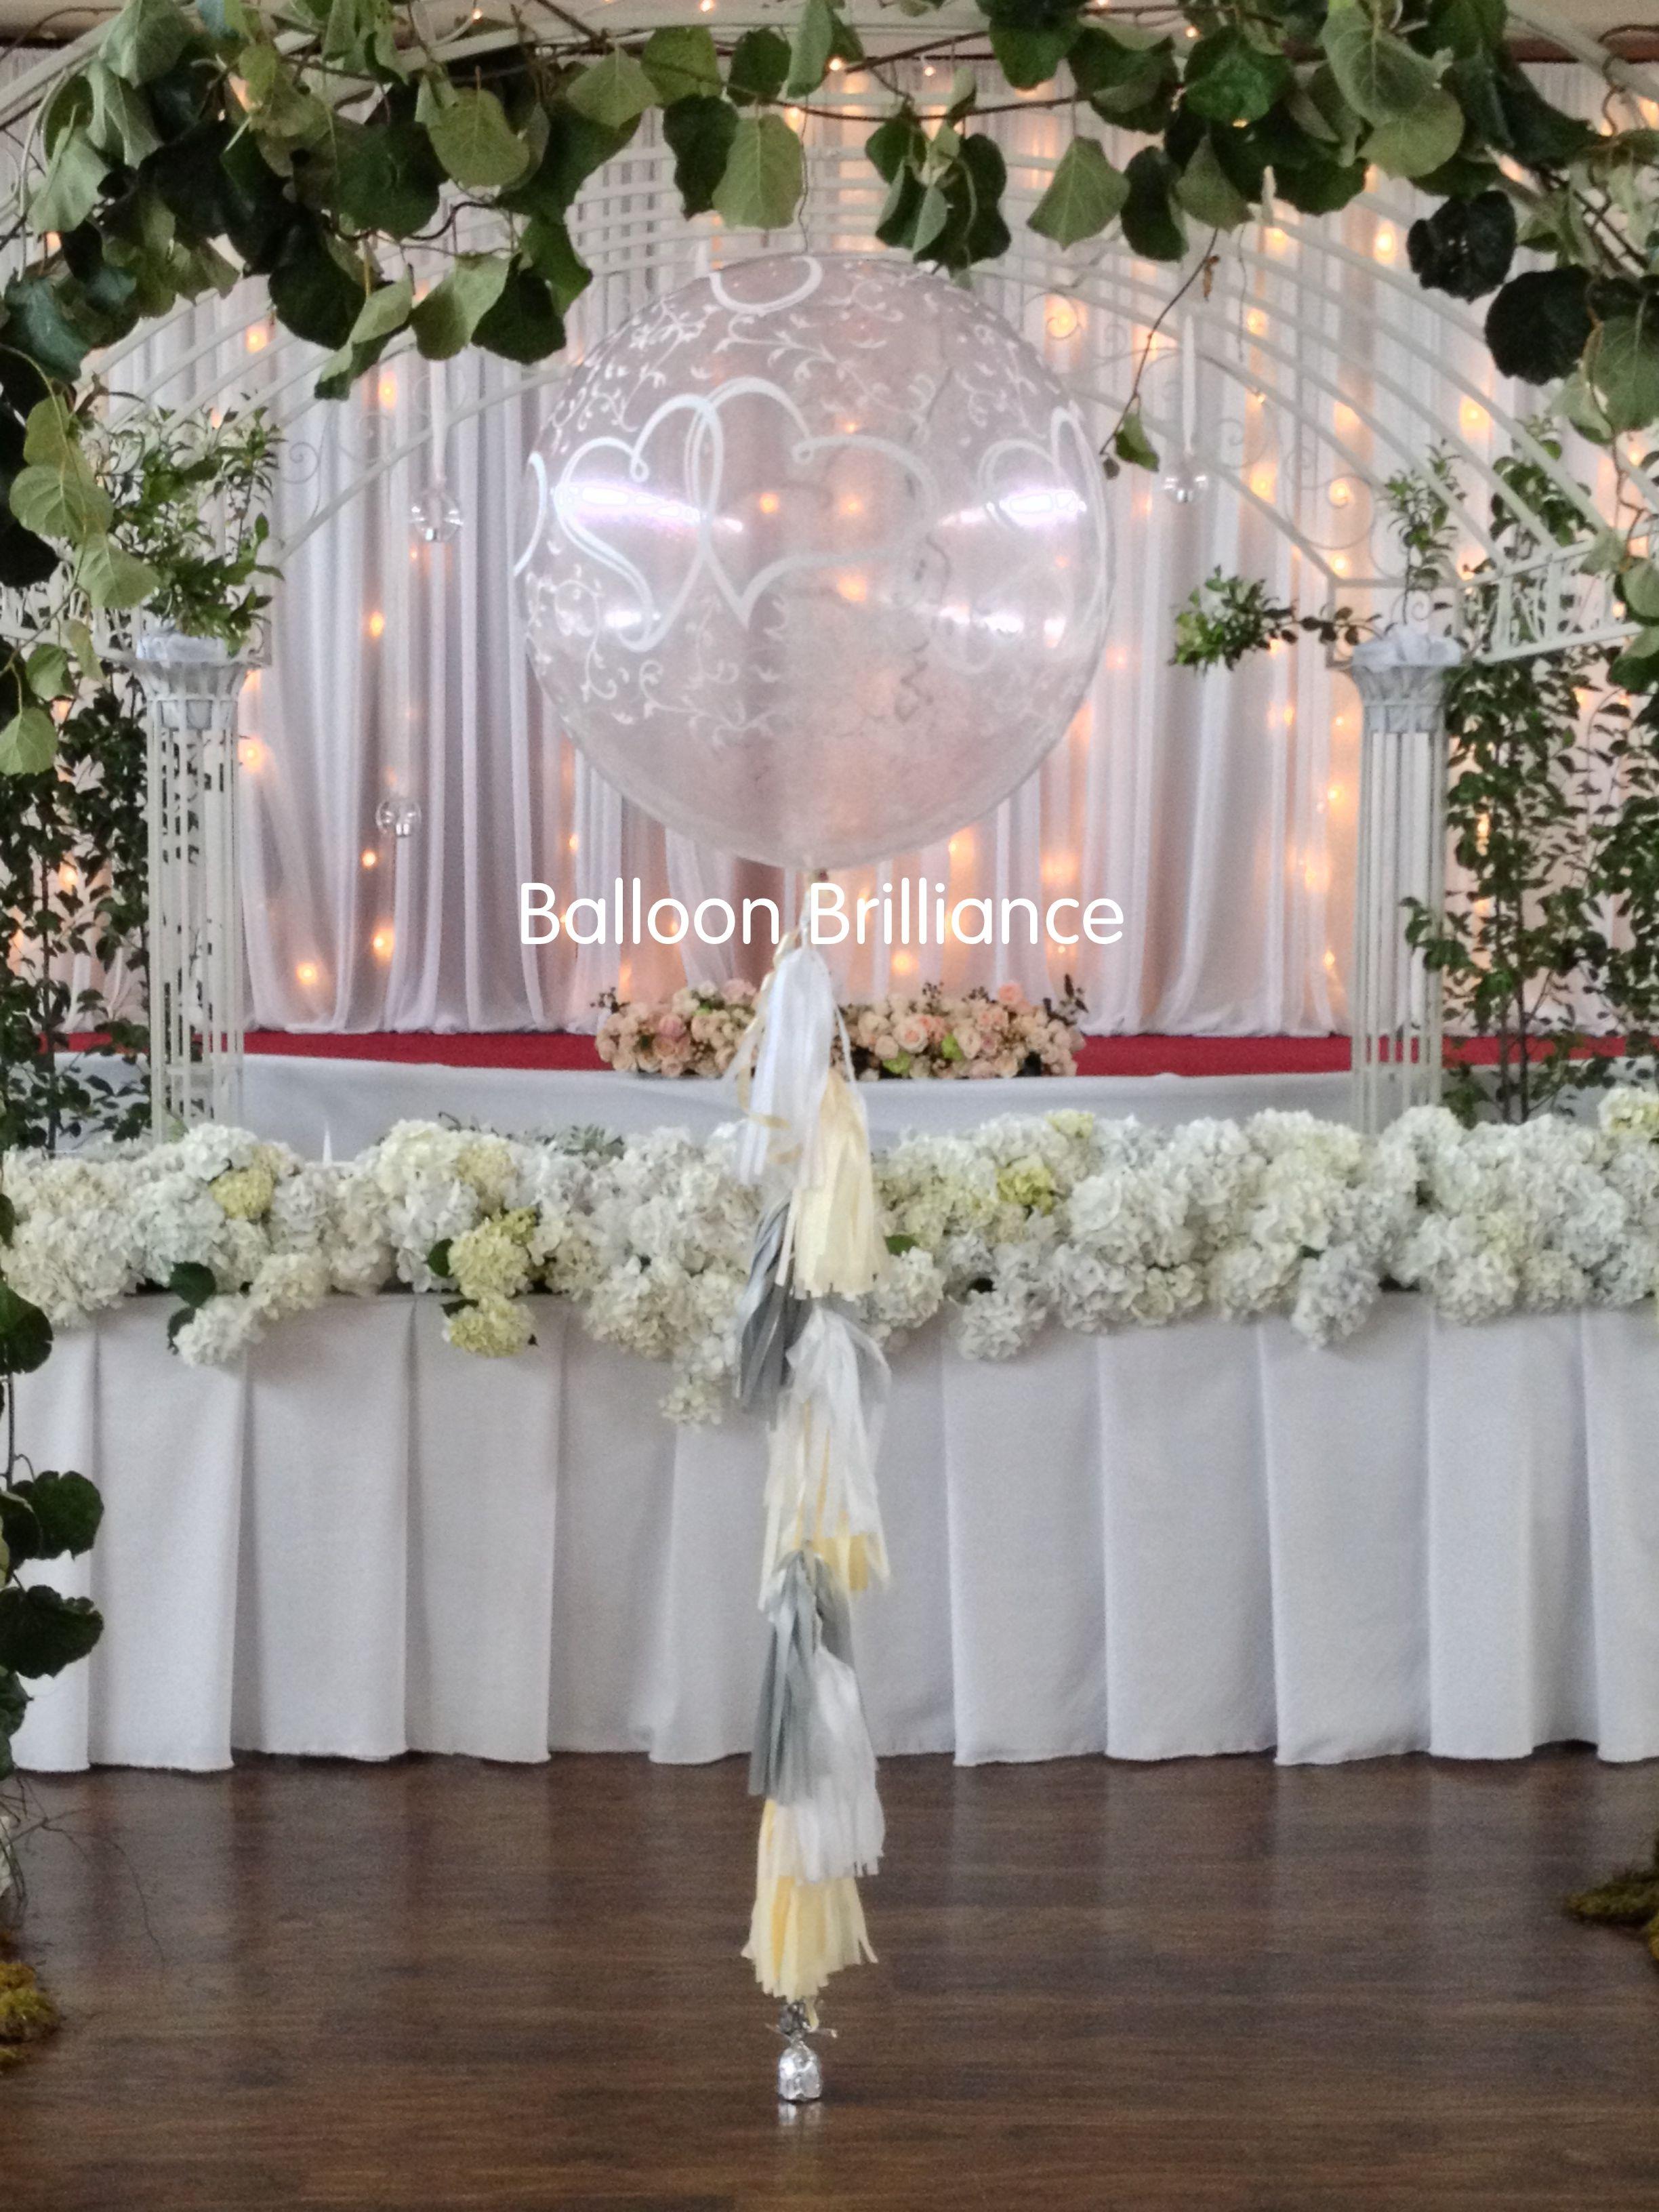 3foot Giant Jumbo Printed Balloon Tassels Engagement Wedding